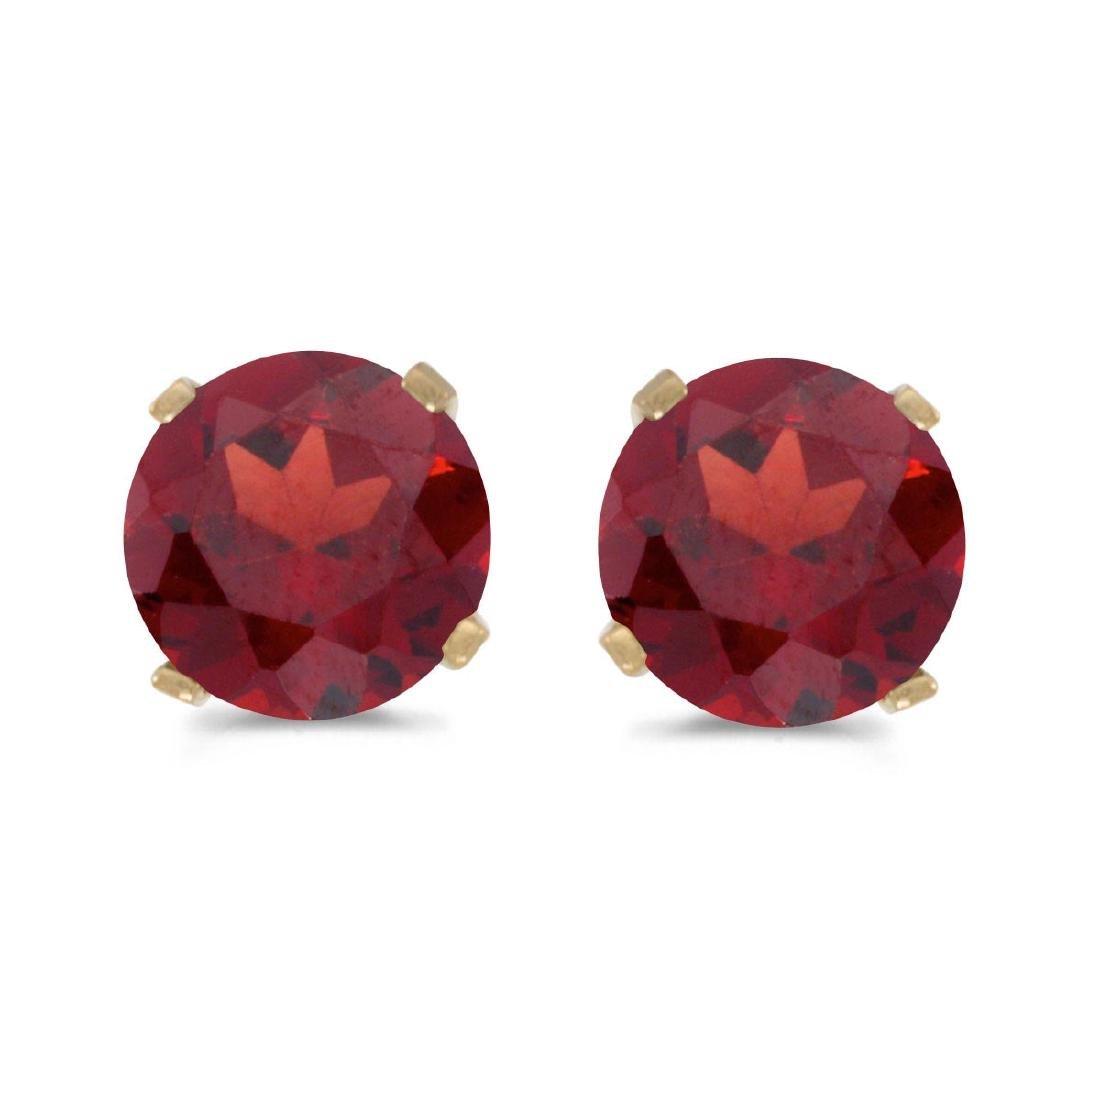 Certified 5 mm Natural Round Garnet Stud Earrings Set i